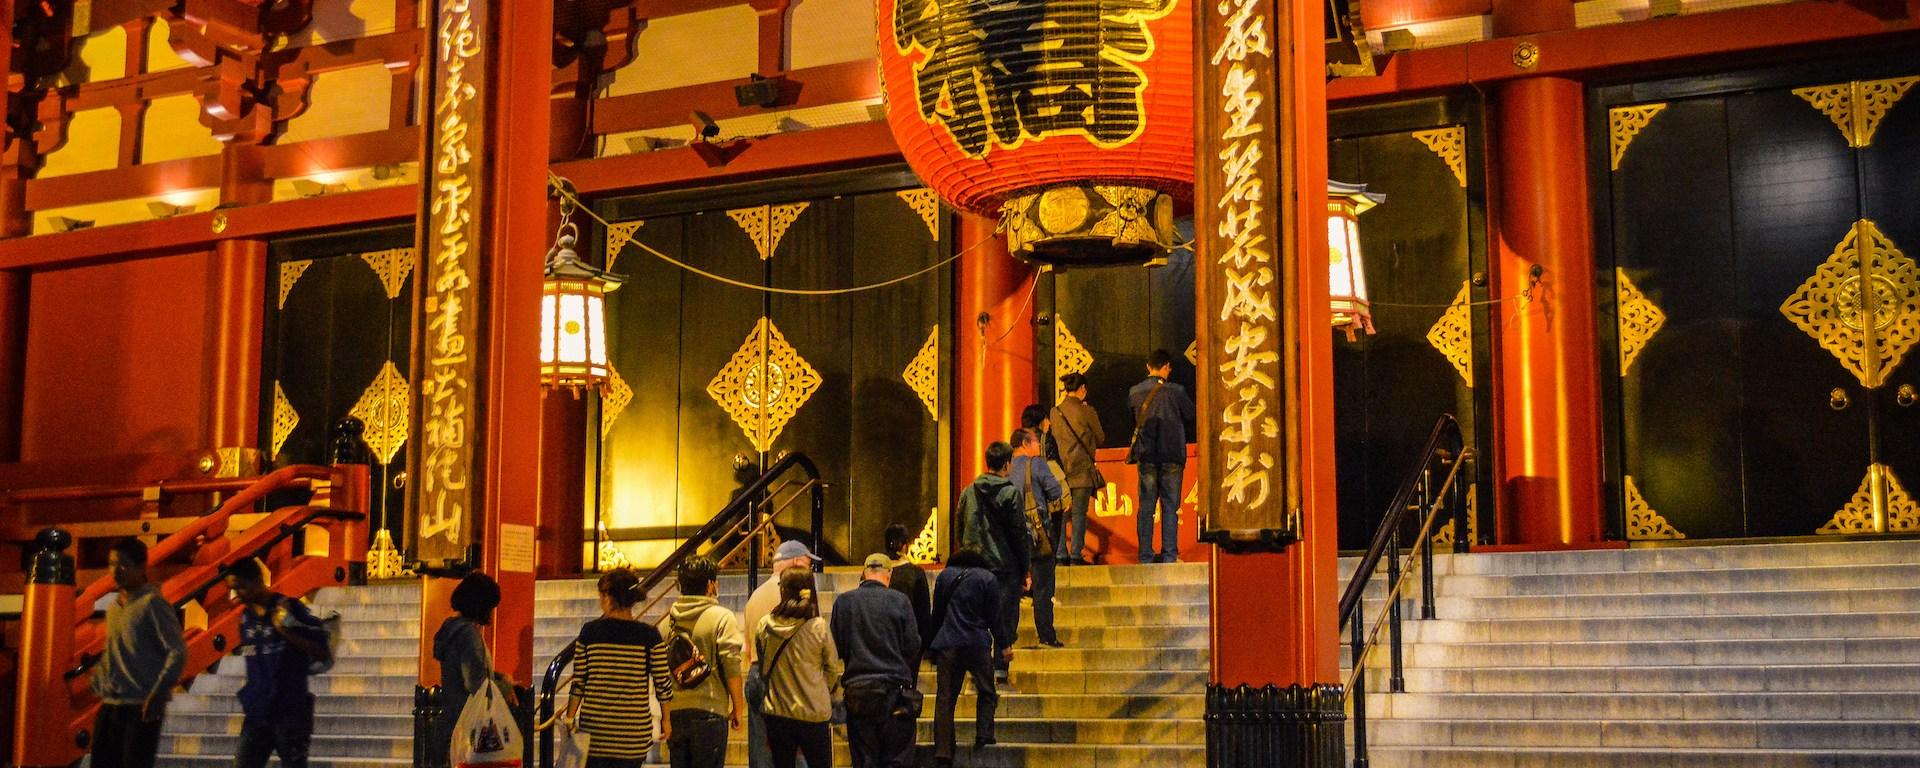 Photo of Senso-Ji Temple in Asakusa, Tokyo Japan